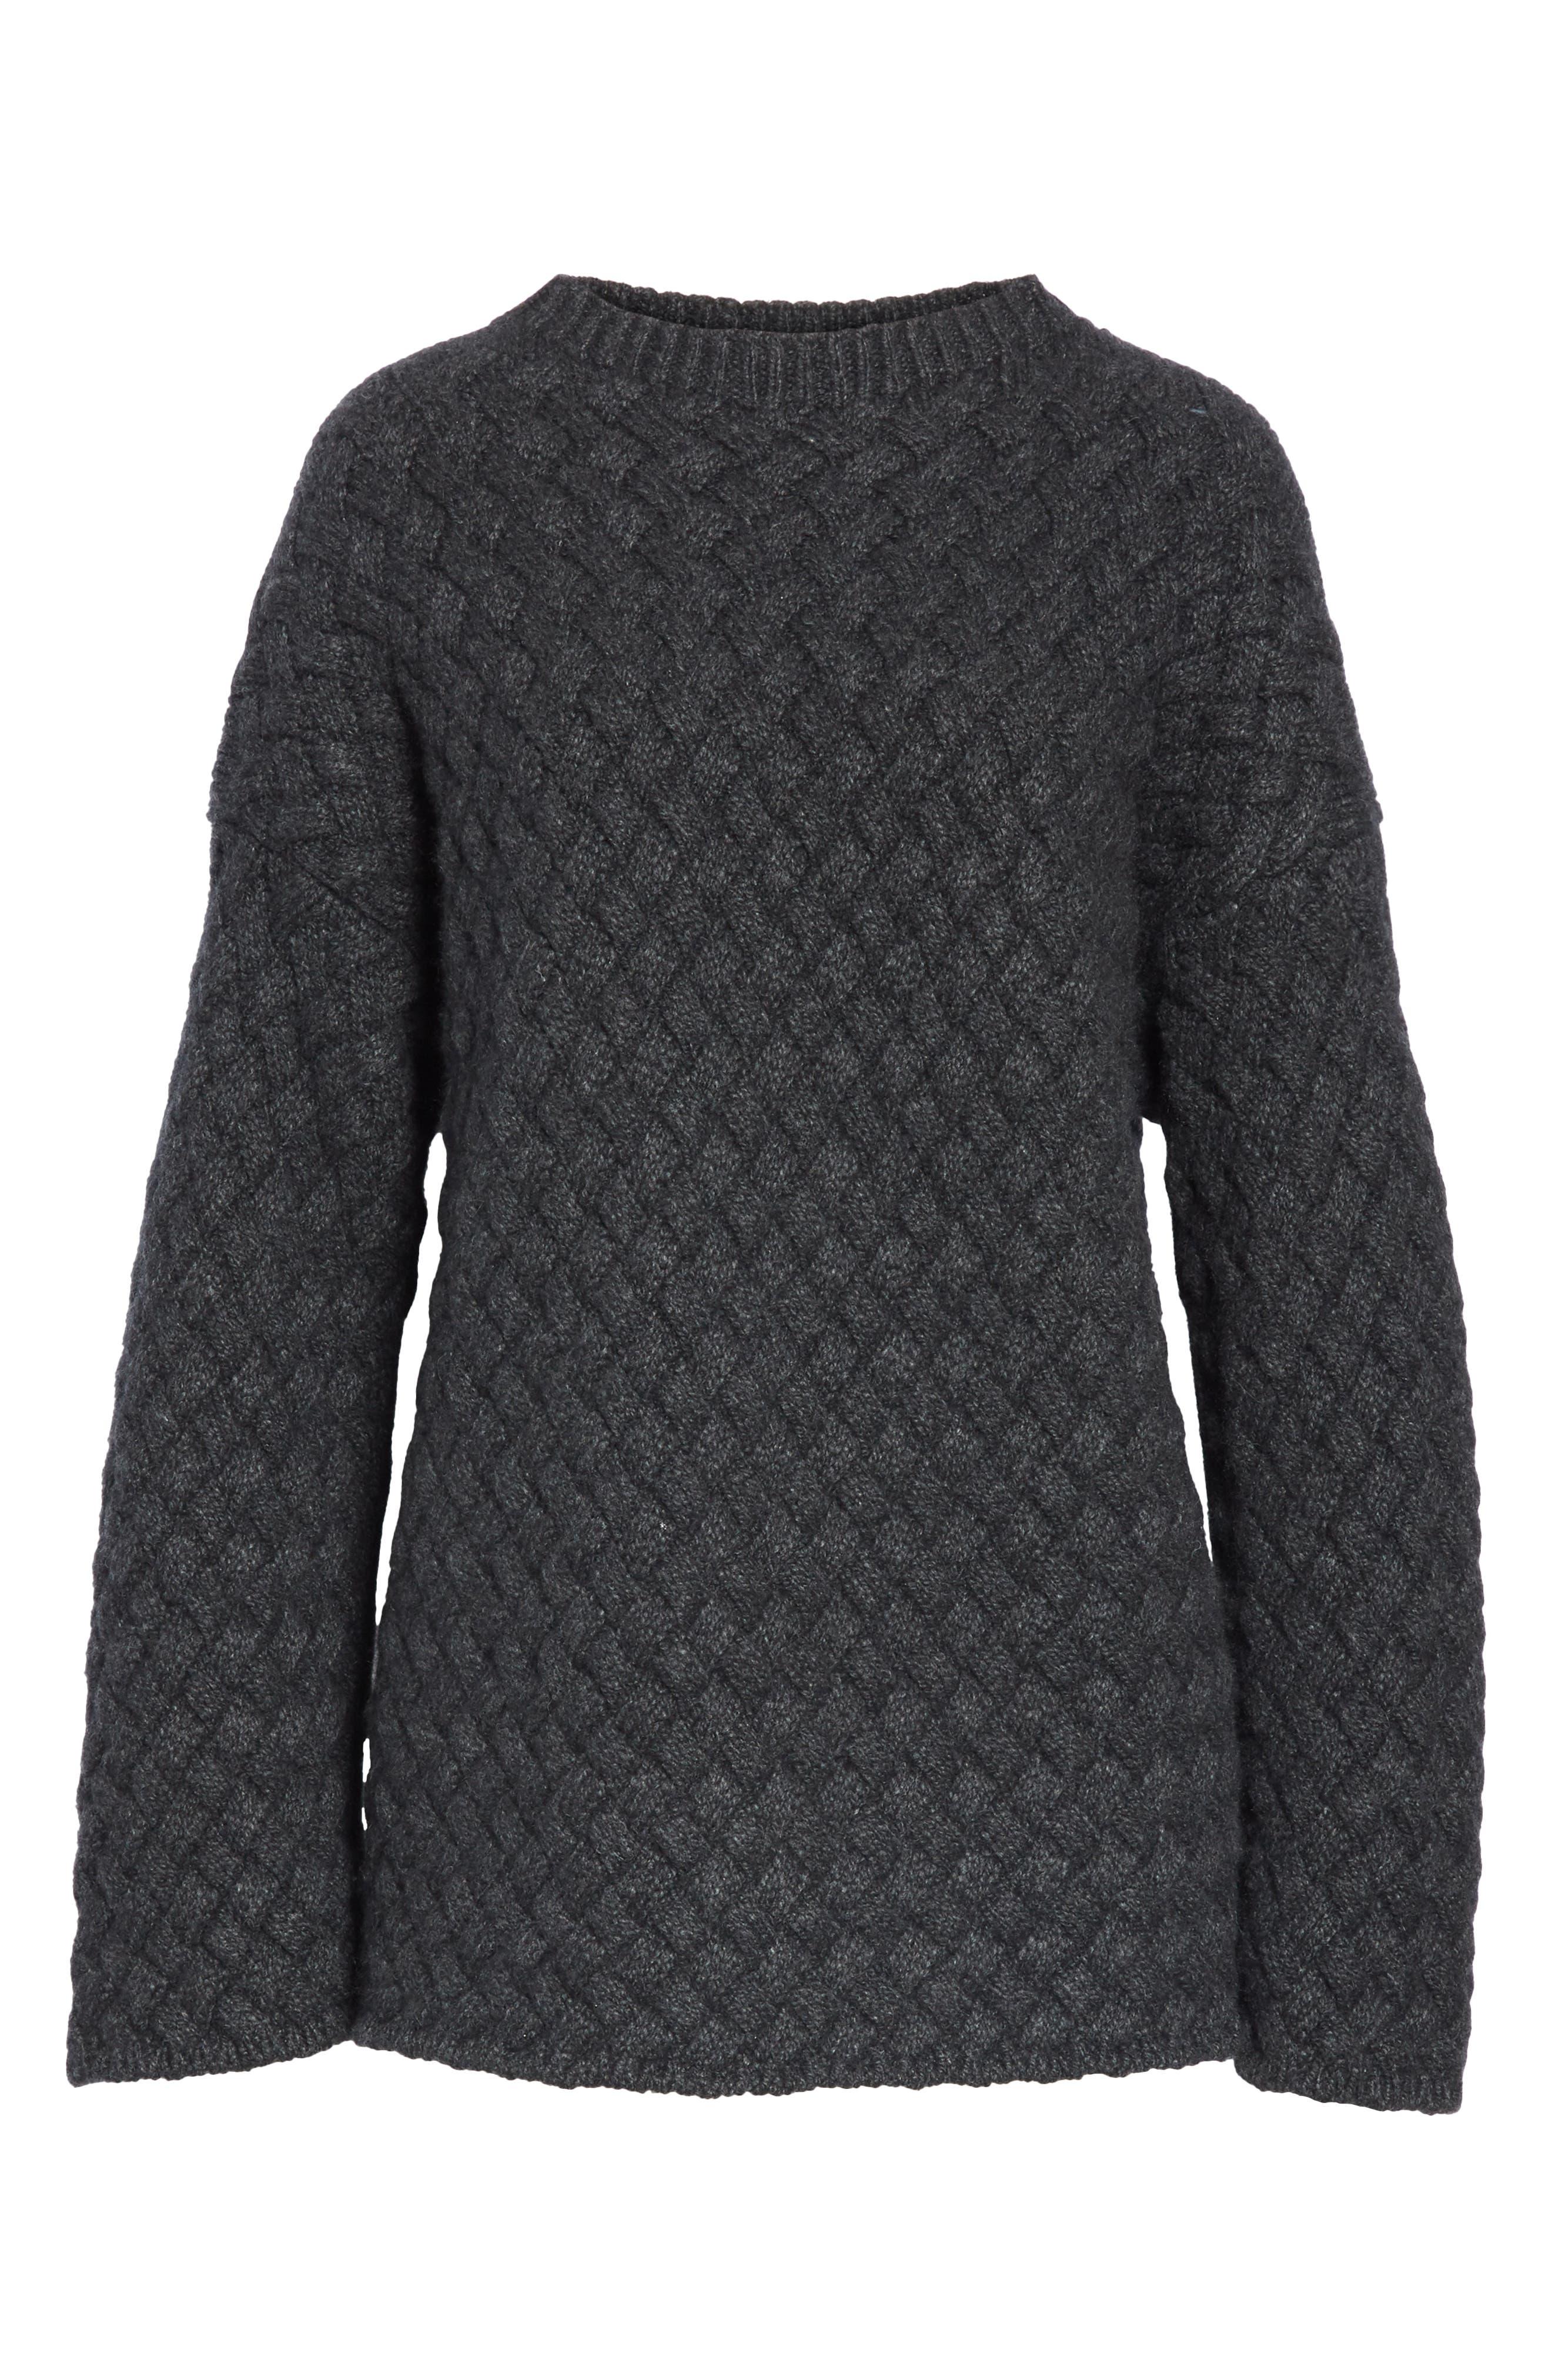 Oversized Braided Cashmere Sweater,                             Alternate thumbnail 7, color,                             DARK GREY